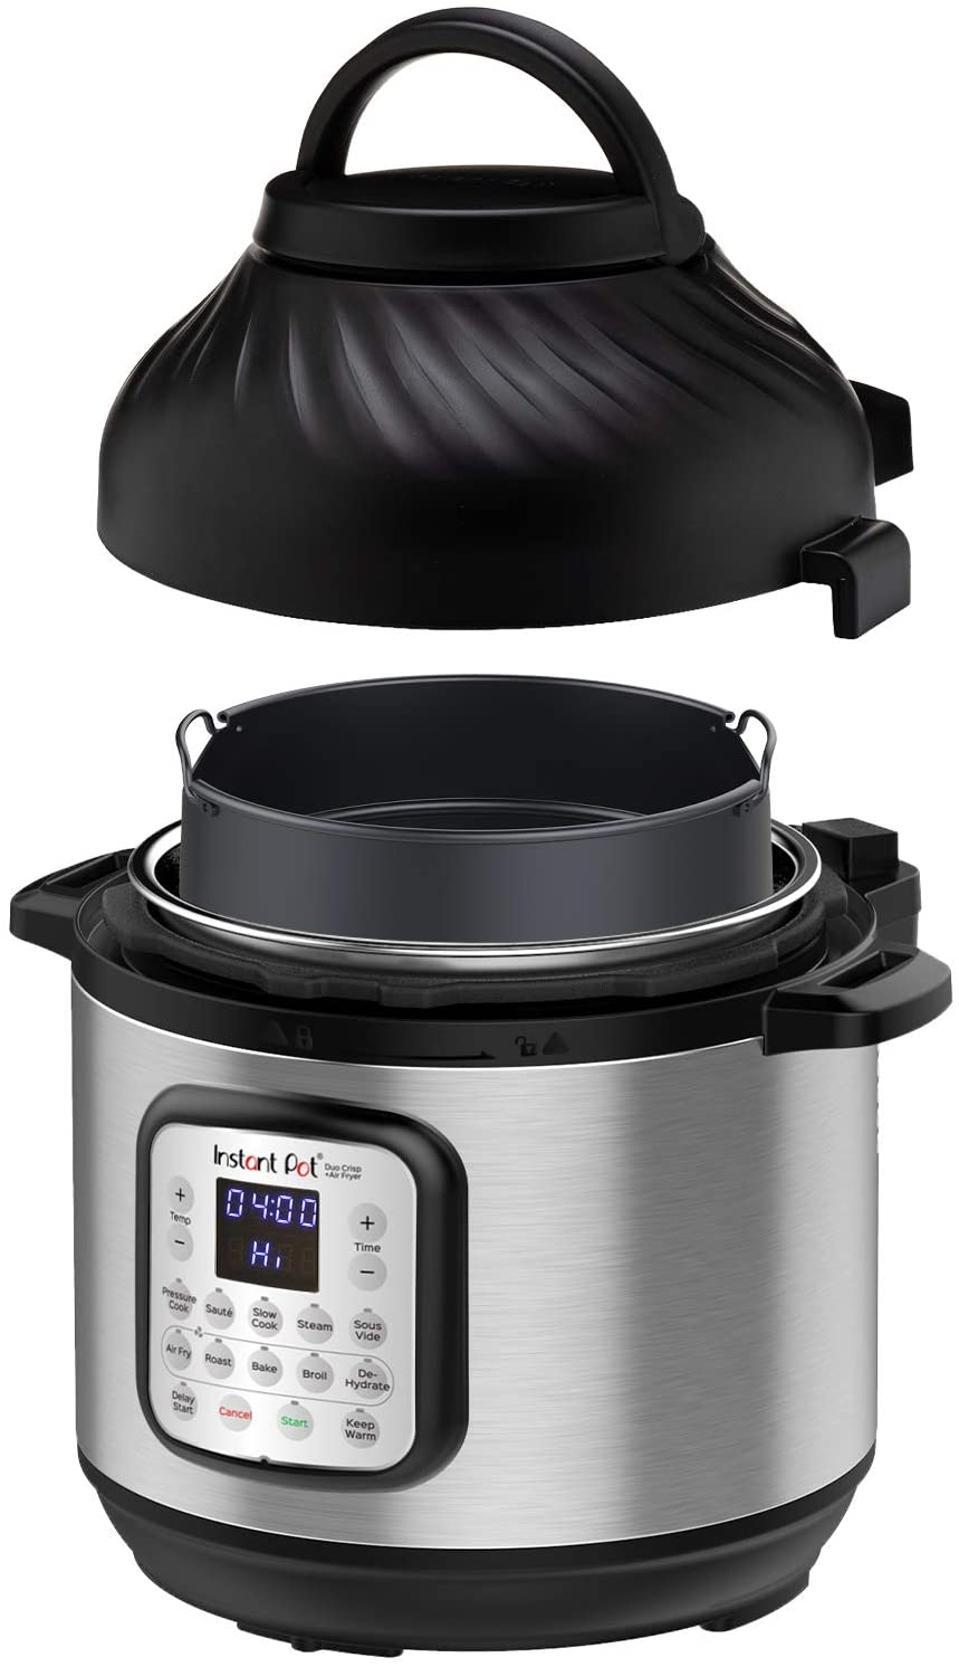 Instant pressure cooker Duo Crisp Pressure 11 in 1 with air fryer, 8 Qt